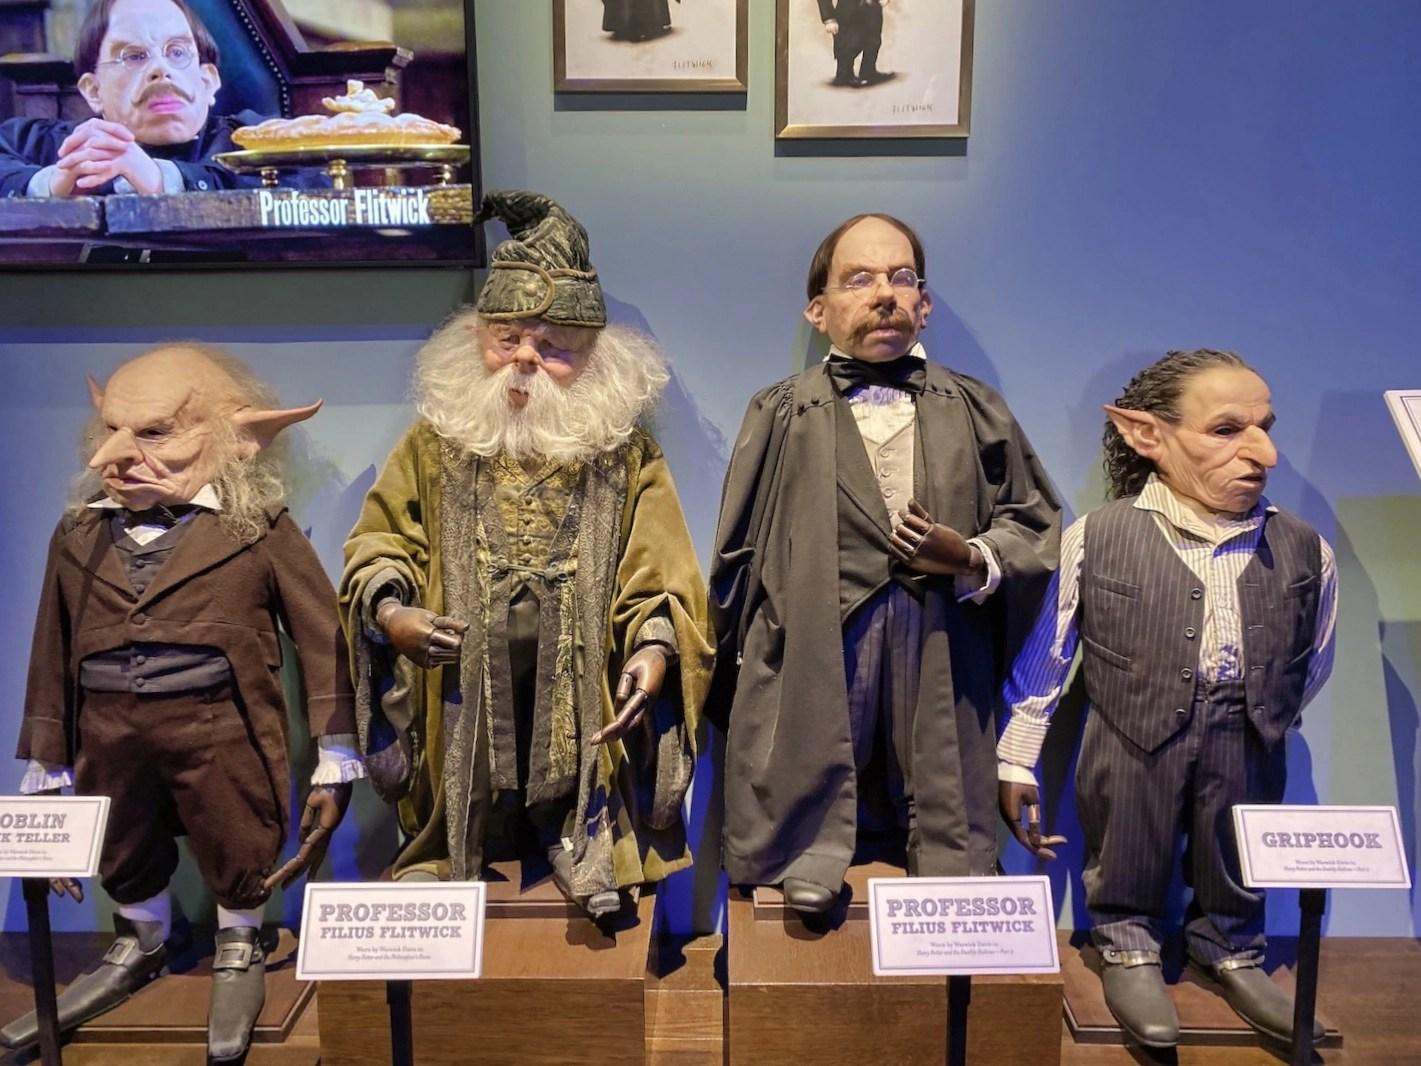 Harry Potter Studio Tour - Creature Department